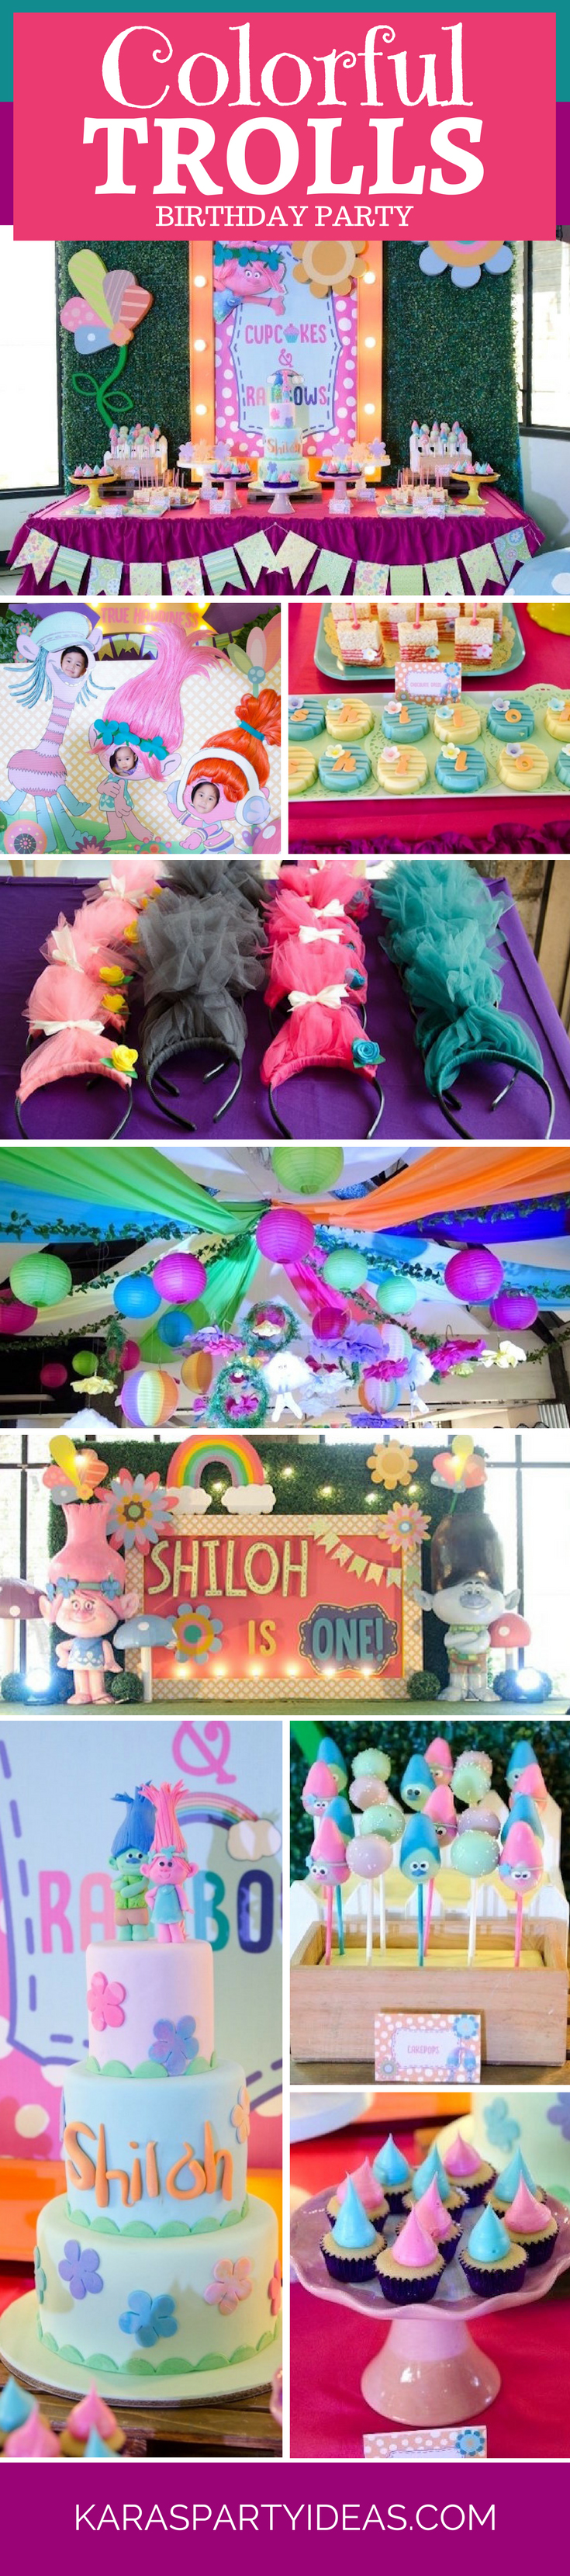 Kara s Party Ideas Colorful Trolls Birthday Party